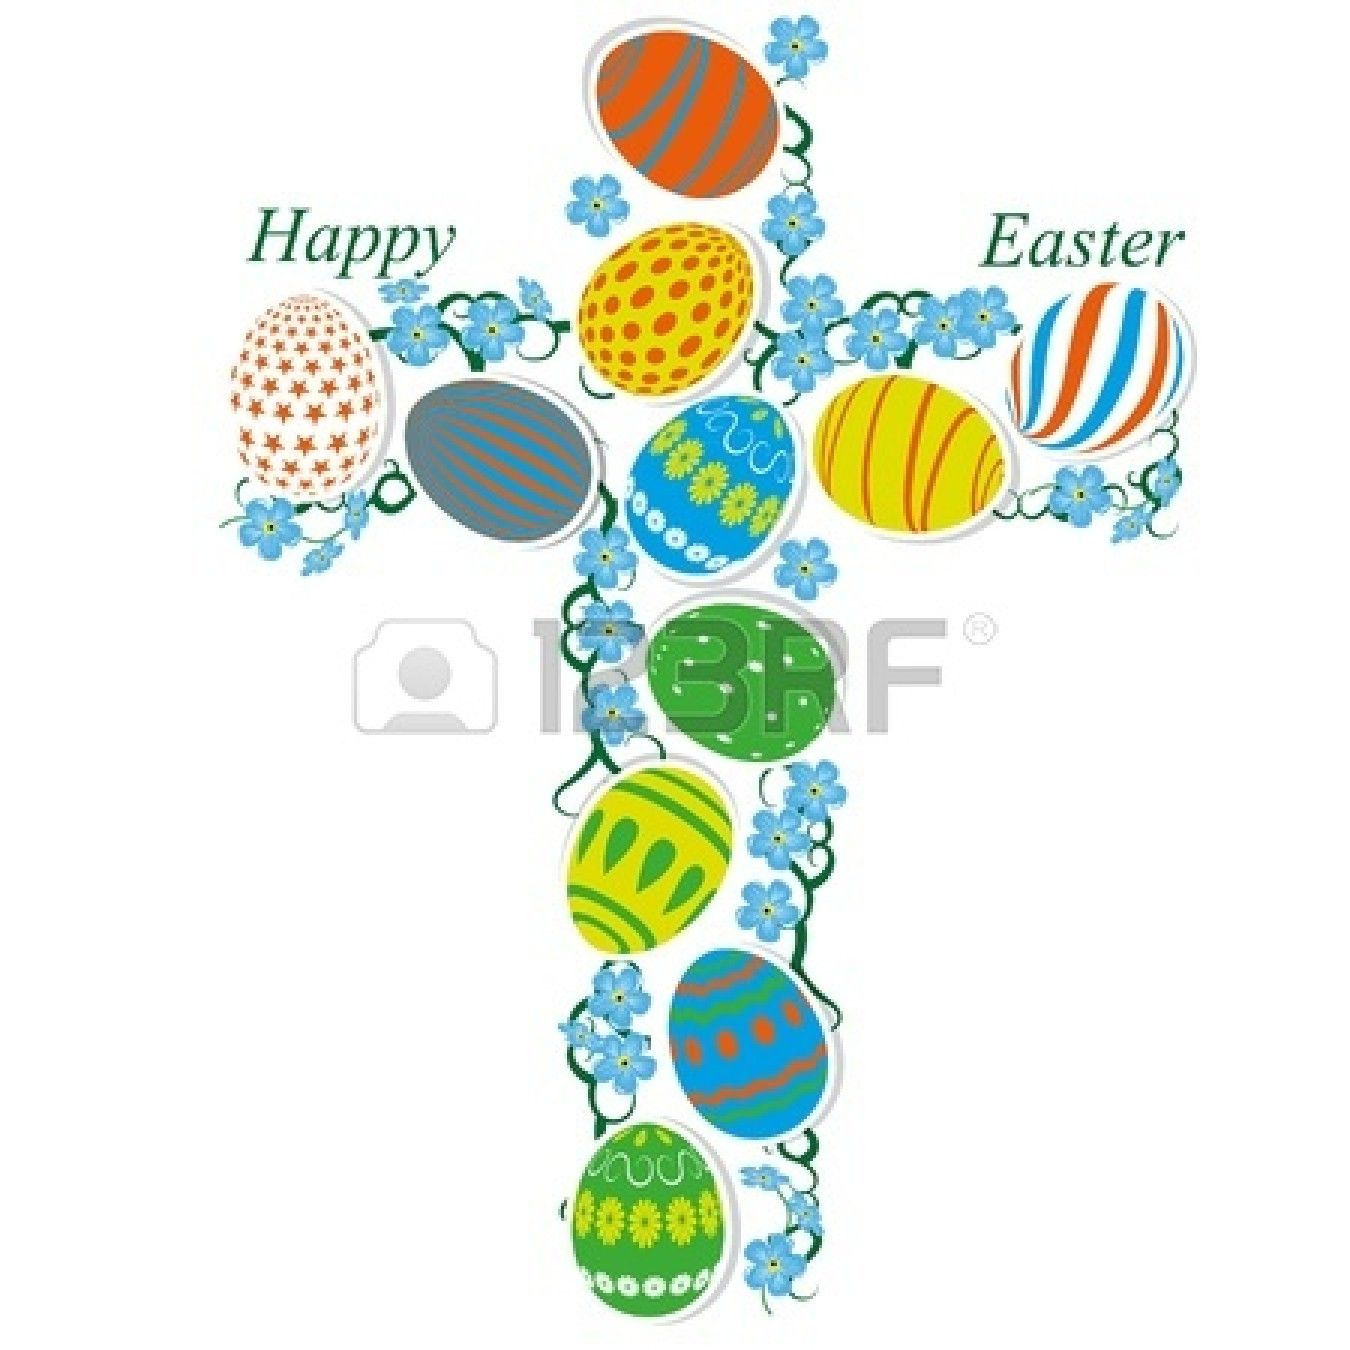 Roman Catholic Cross Designs Clipart Panda Free Clipart.